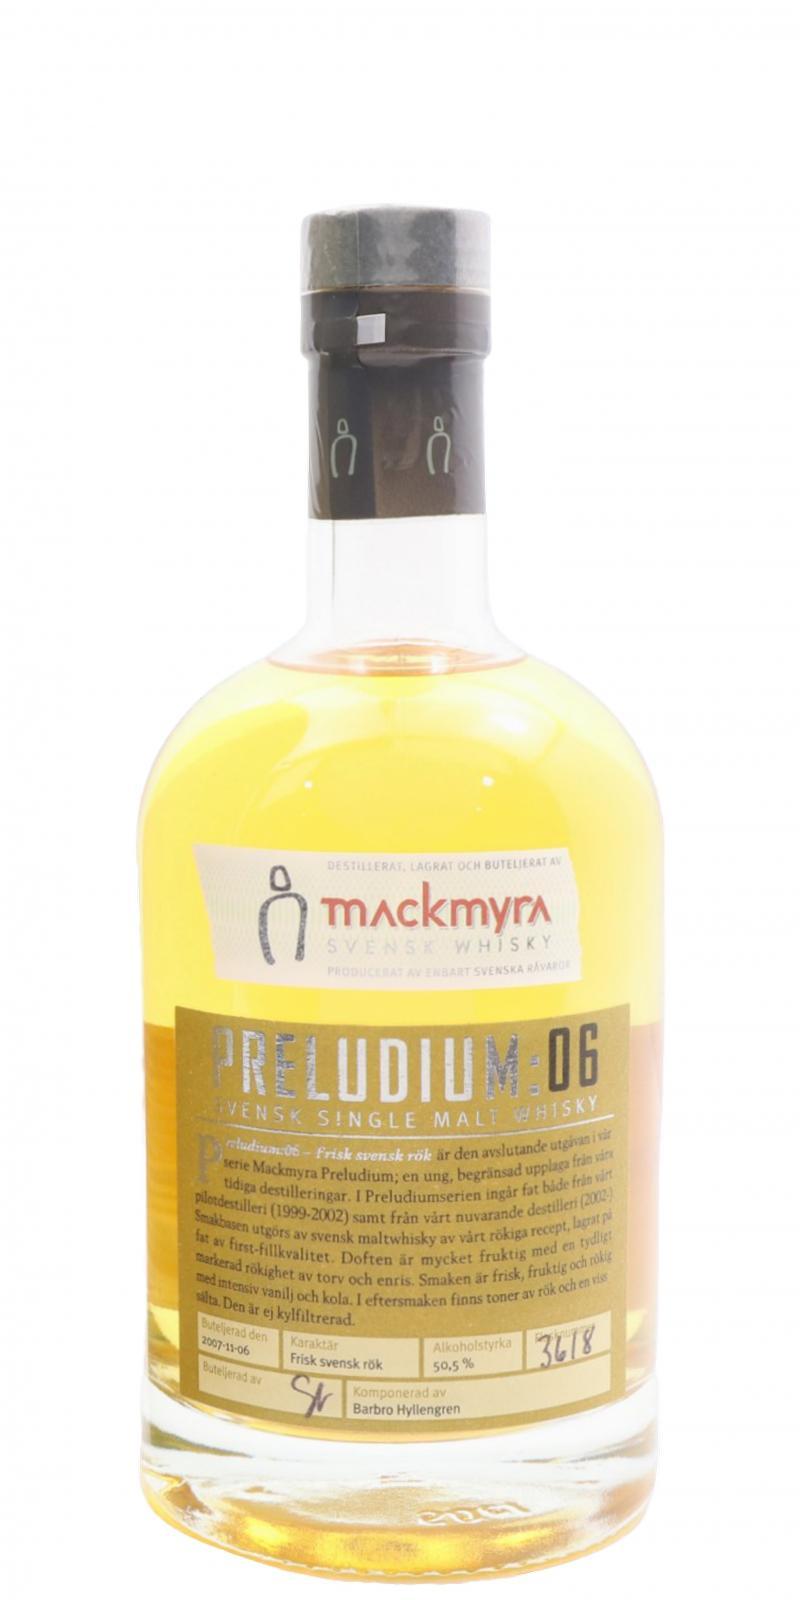 Mackmyra Preludium: 06